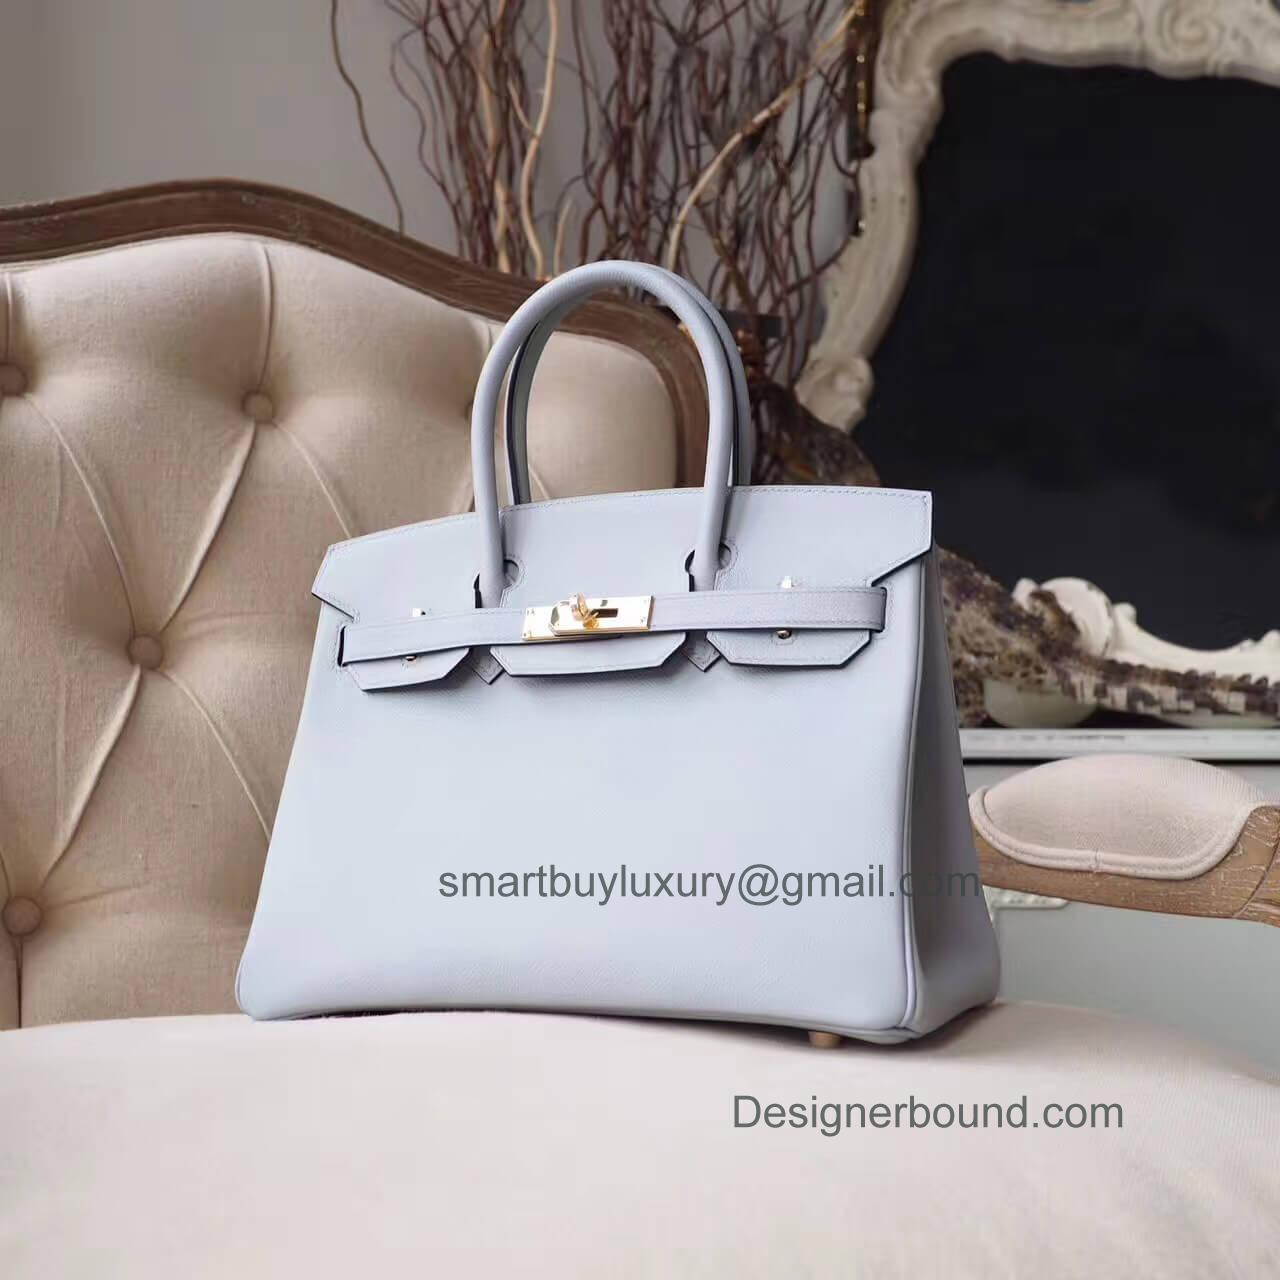 fd64298e1a99 Hermes Birkin 30 Handbag in 4z Gris Mouette Epsom GHW - Hermes Replica